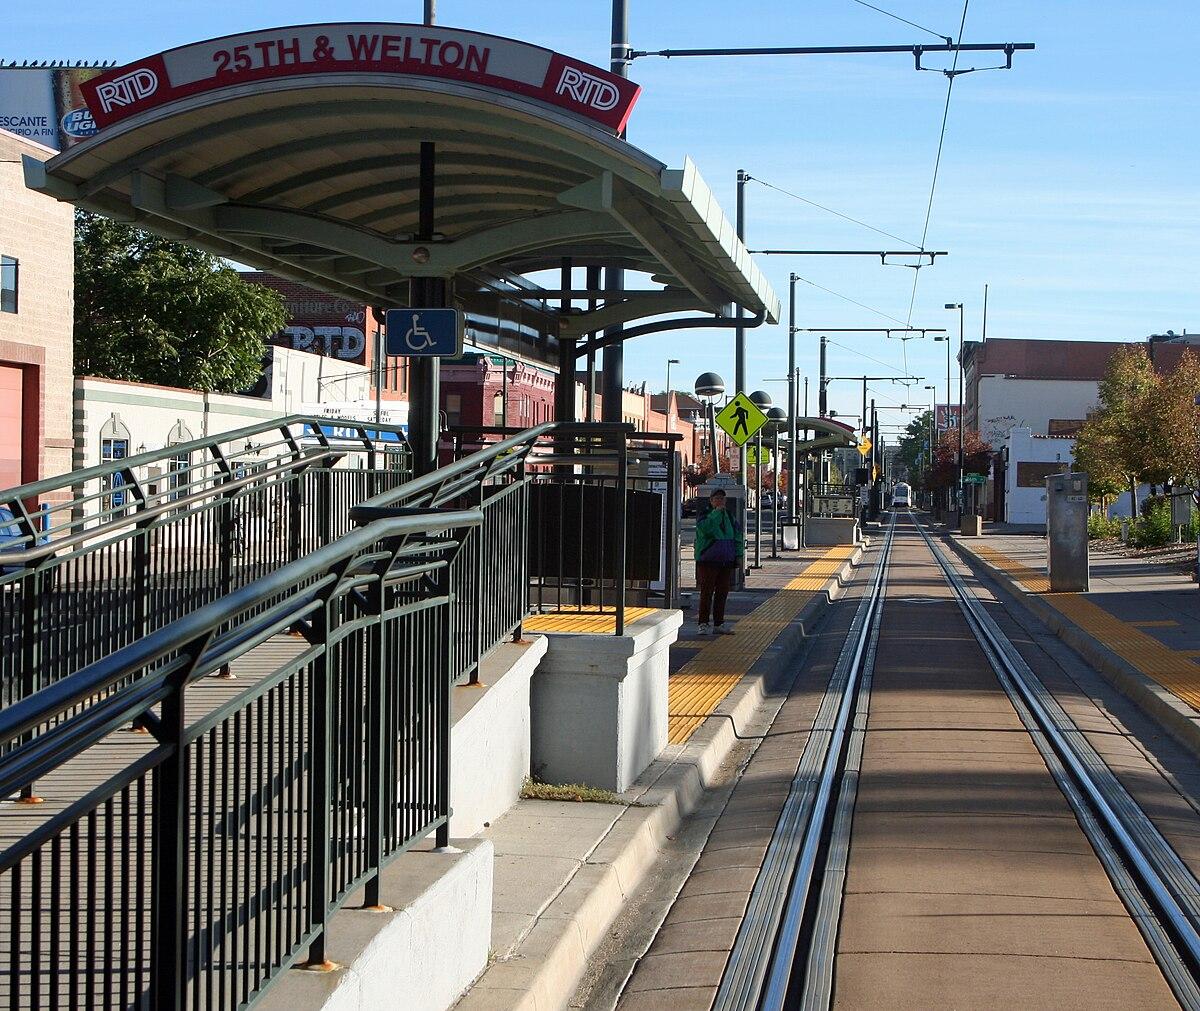 25th & Welton Station